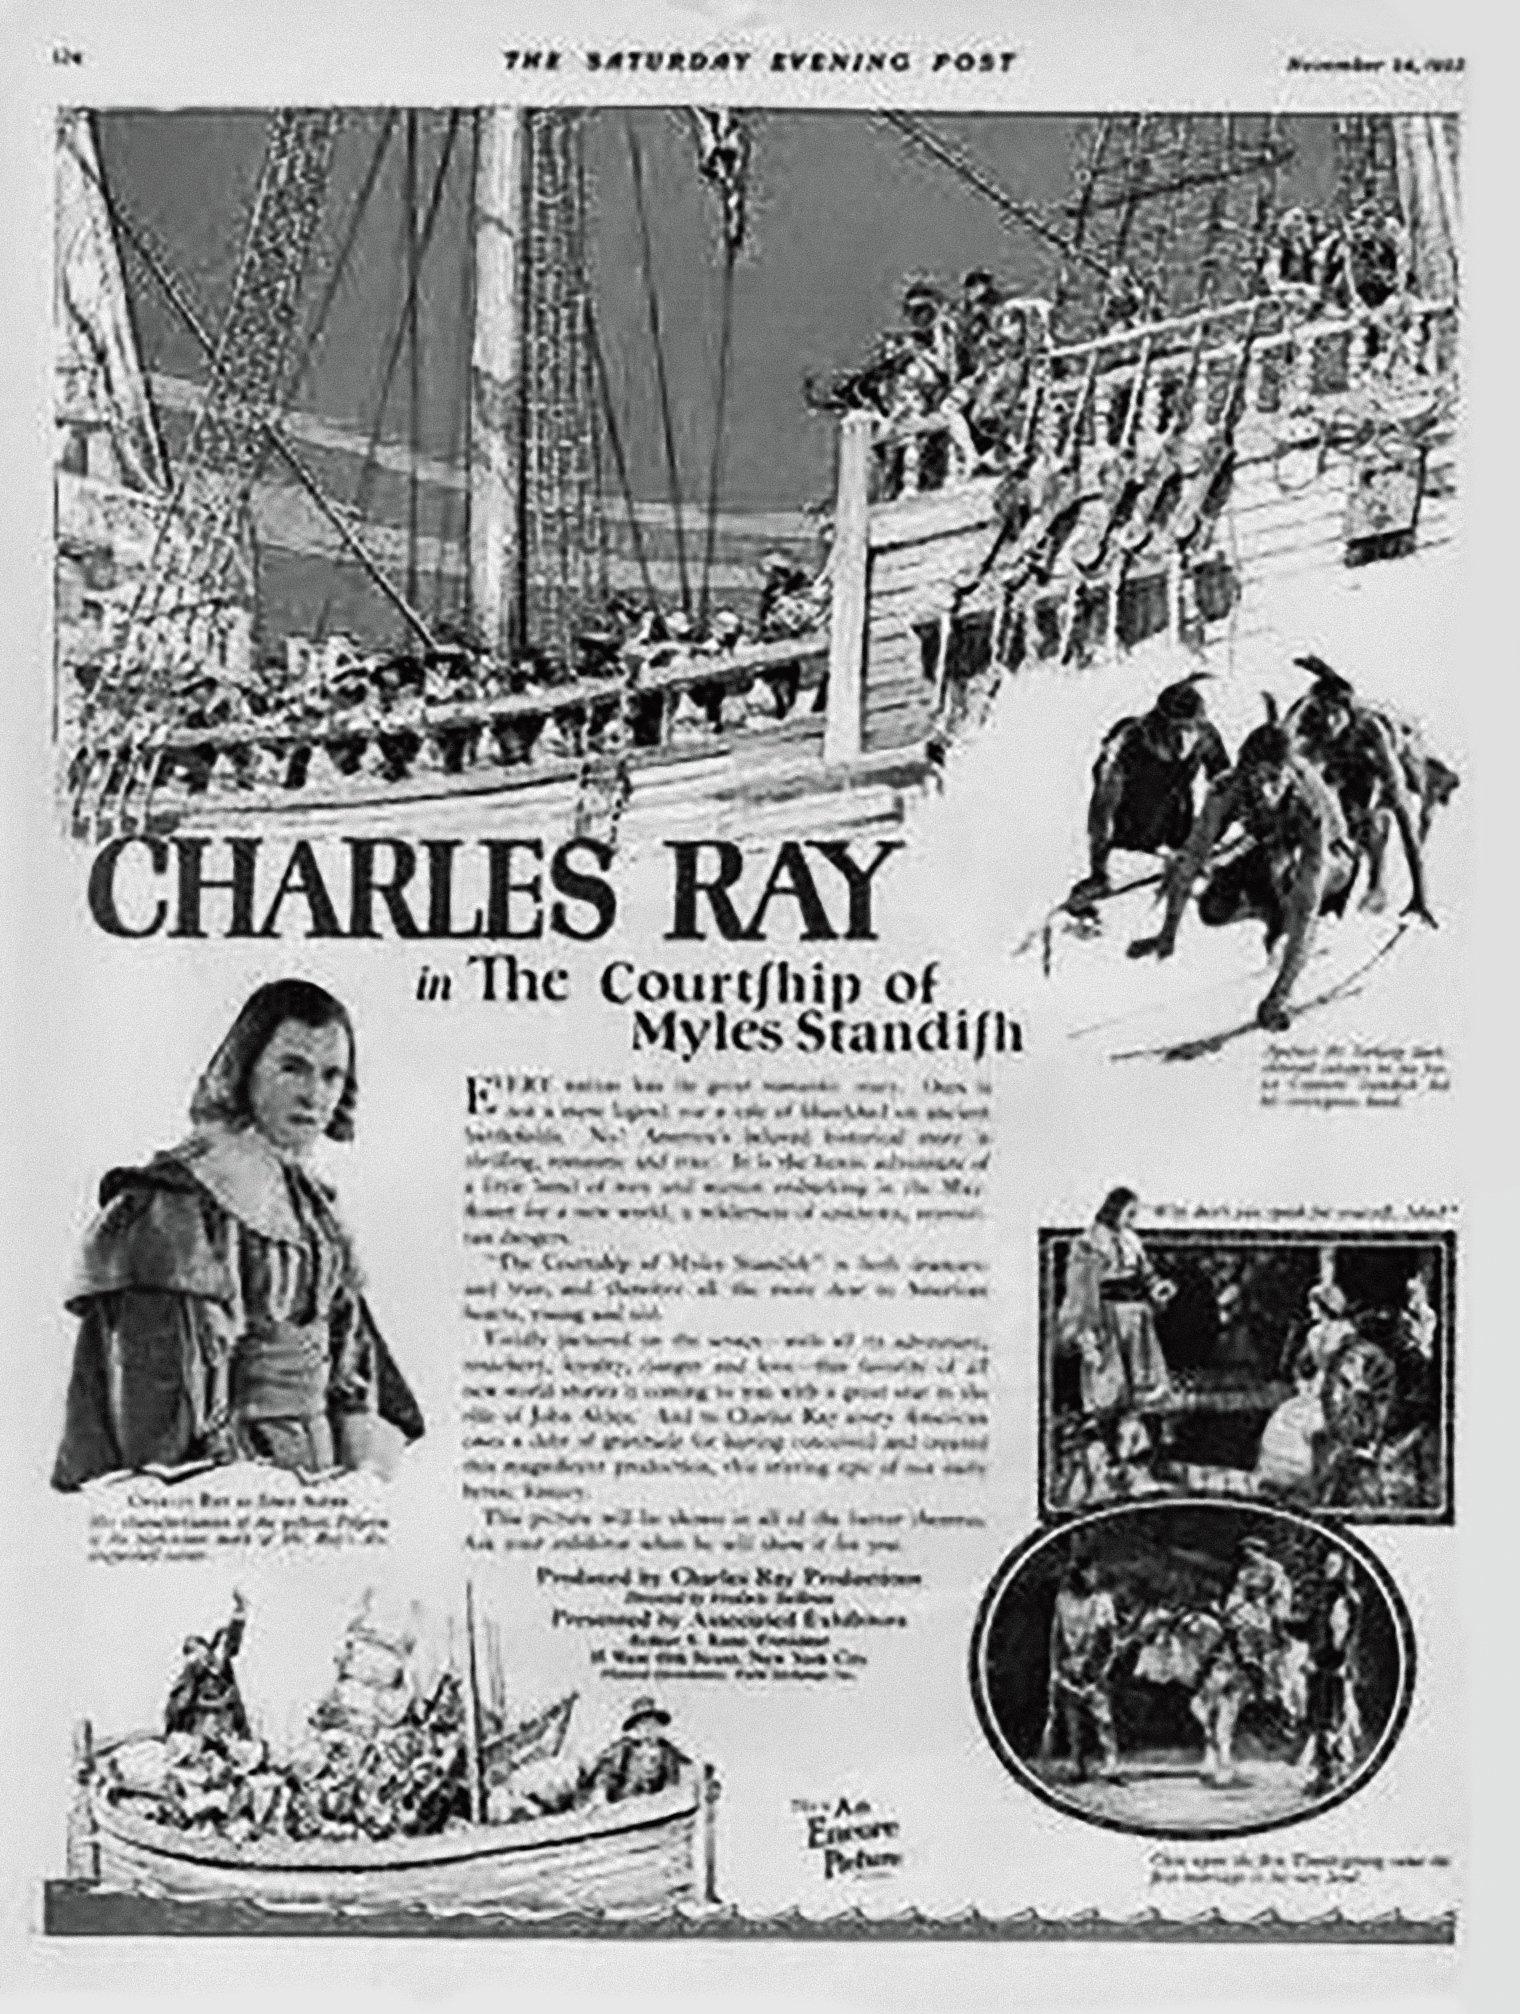 Charles Ray Filme